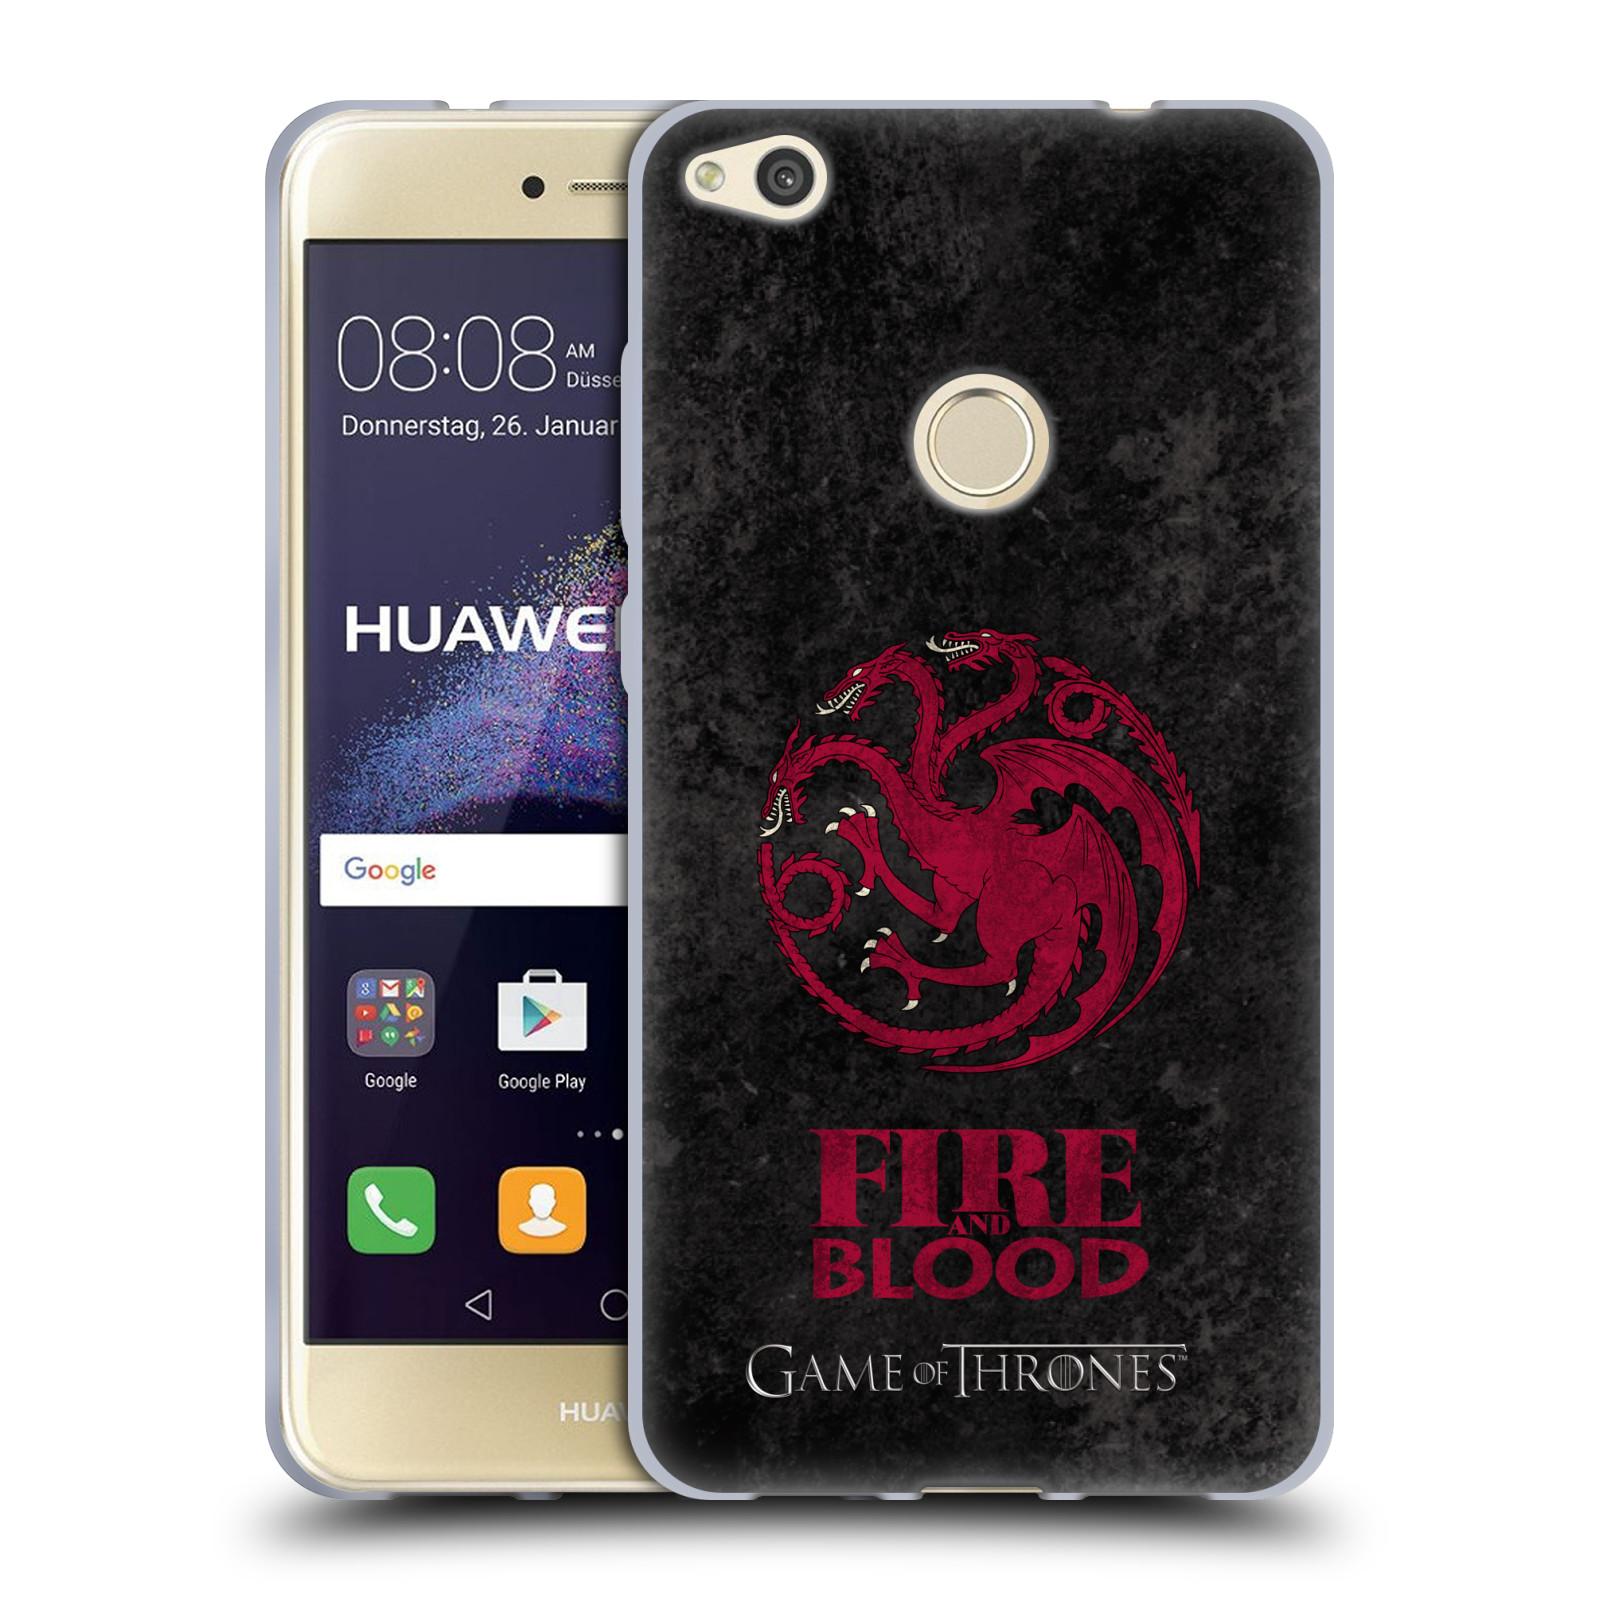 Silikonové pouzdro na mobil Huawei P9 Lite (2017) HEAD CASE Hra o trůny - Sigils Targaryen - Fire and Blood (Silikonový kryt či obal na mobilní telefon s licencovaným motivem Hra o trůny - Game Of Thrones pro Huawei P9 Lite 2017)